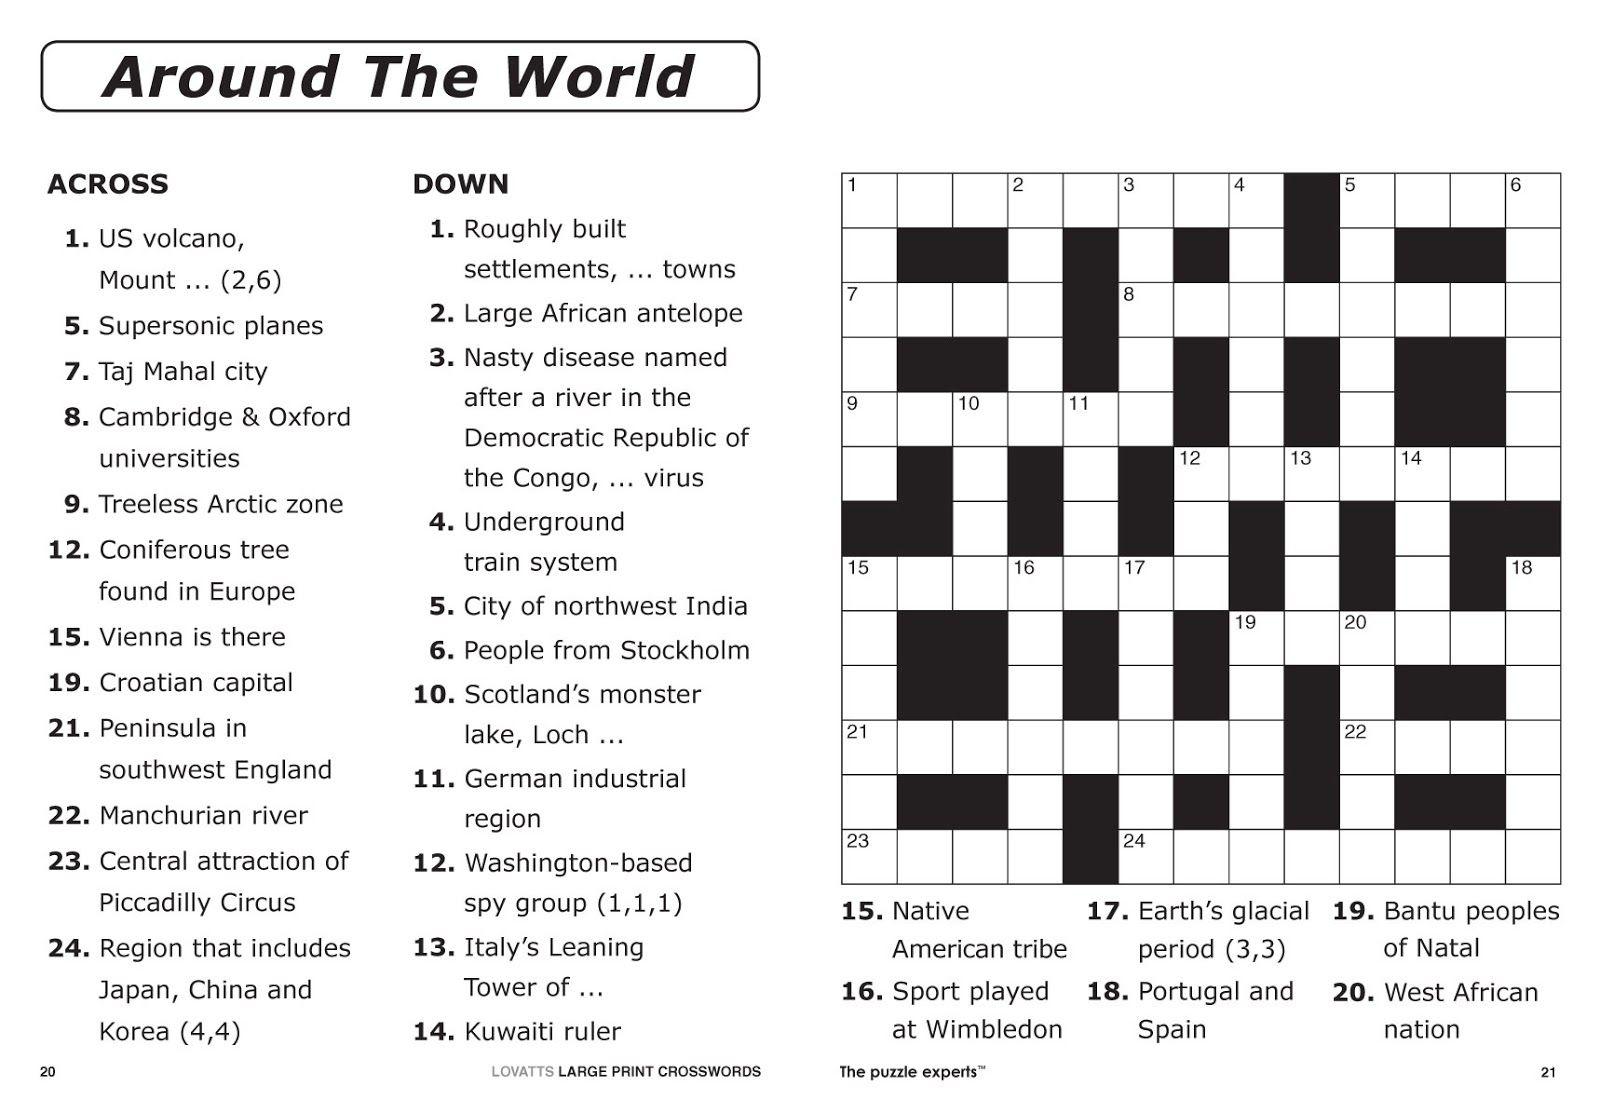 Easy Printable Crossword Puzzles | Elder Care & Dementia Care - Free Crossword Puzzle Maker Printable 50 Words